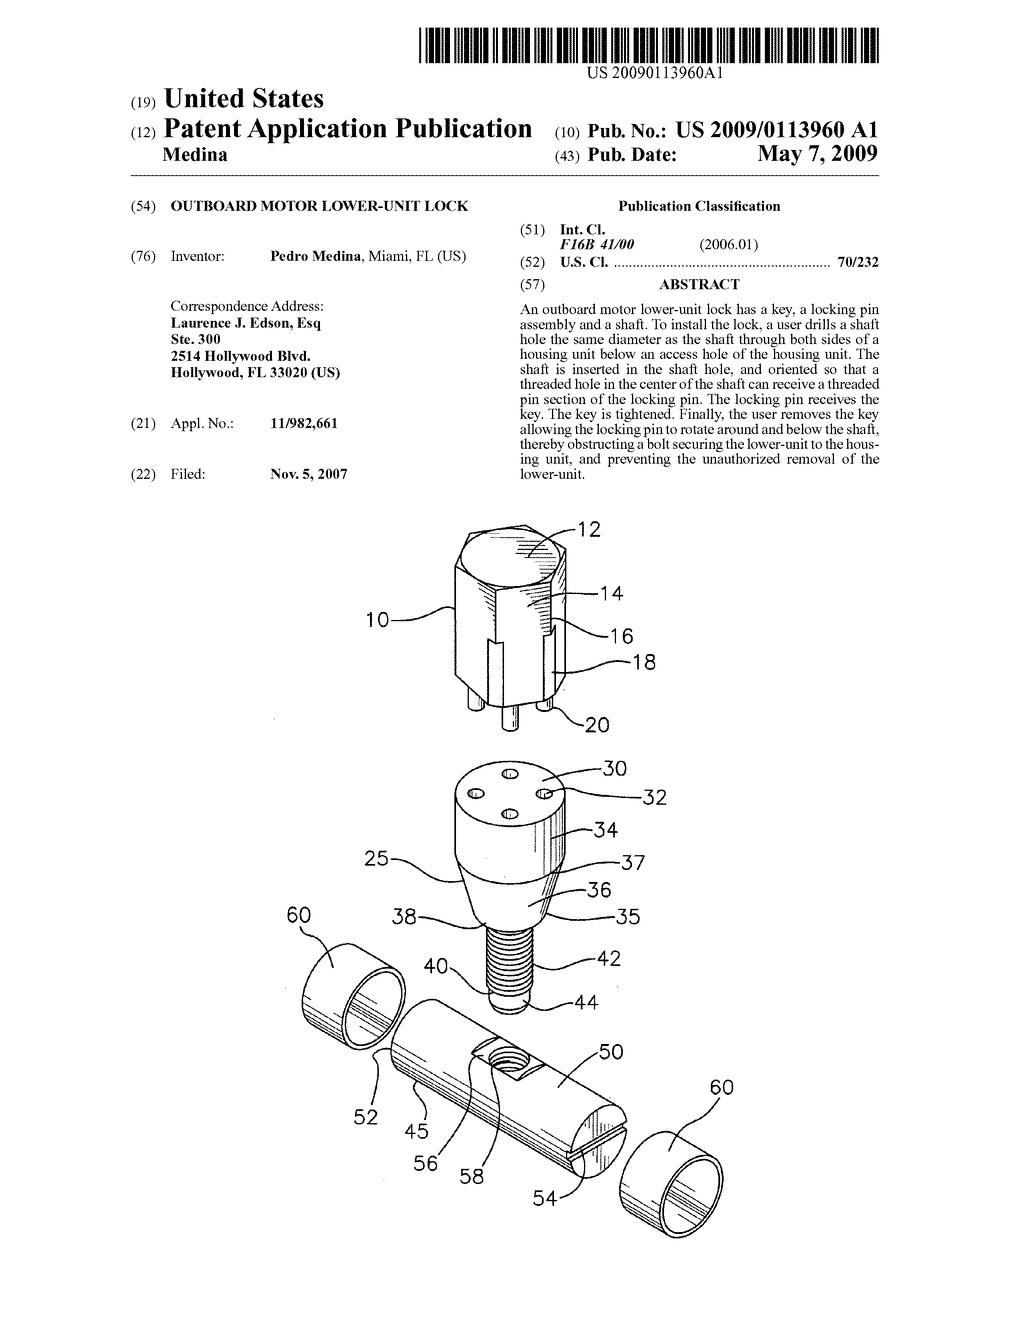 outboard motor lower unit lock diagram, schematic, and image 01 outboard motor steering diagram outboard motor lower unit diagram #14